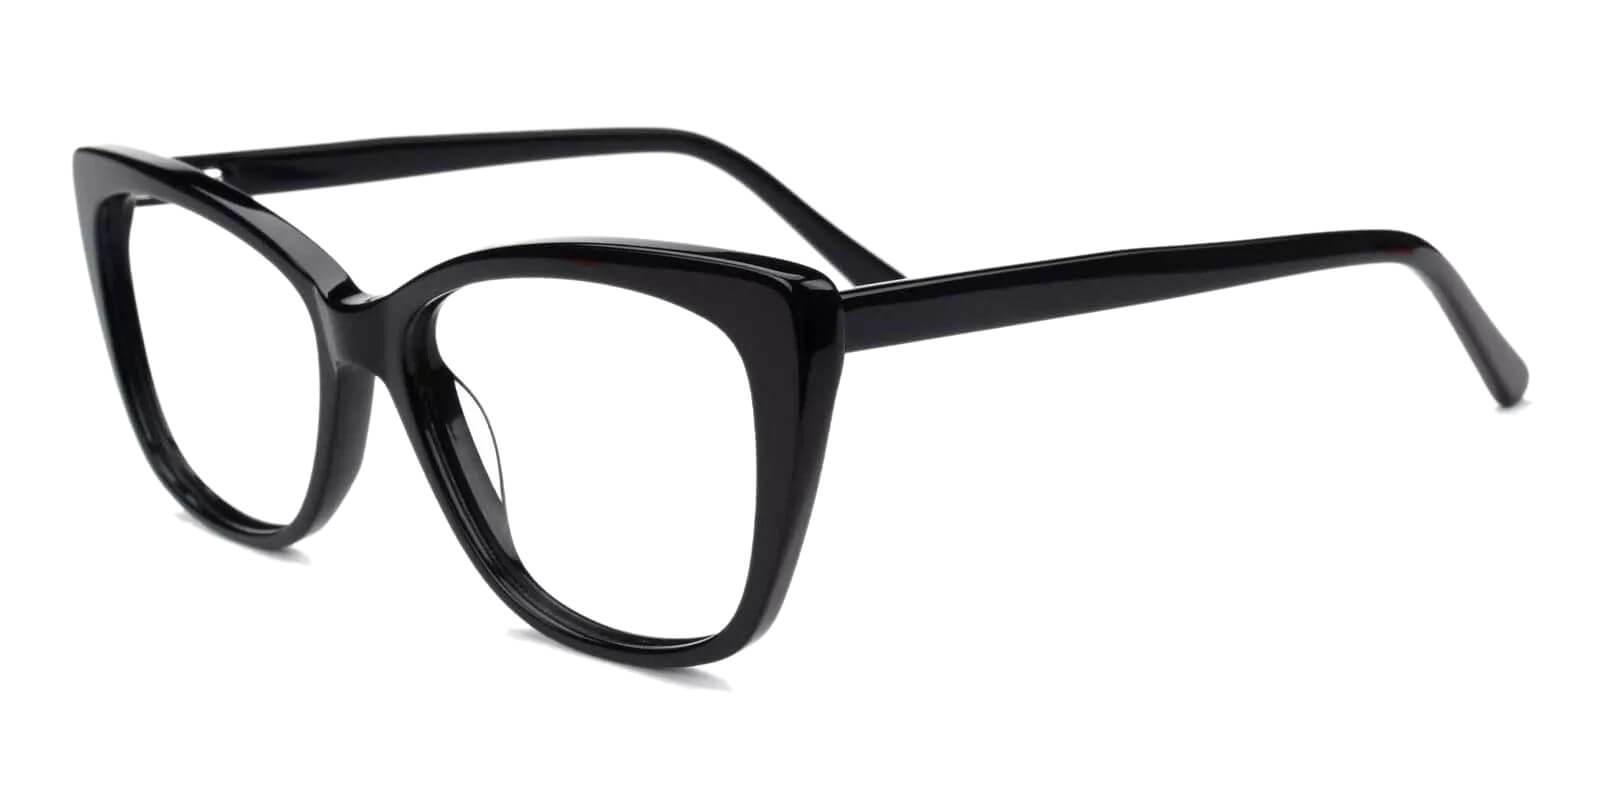 Truda Black Acetate Eyeglasses , Fashion , SpringHinges , UniversalBridgeFit Frames from ABBE Glasses